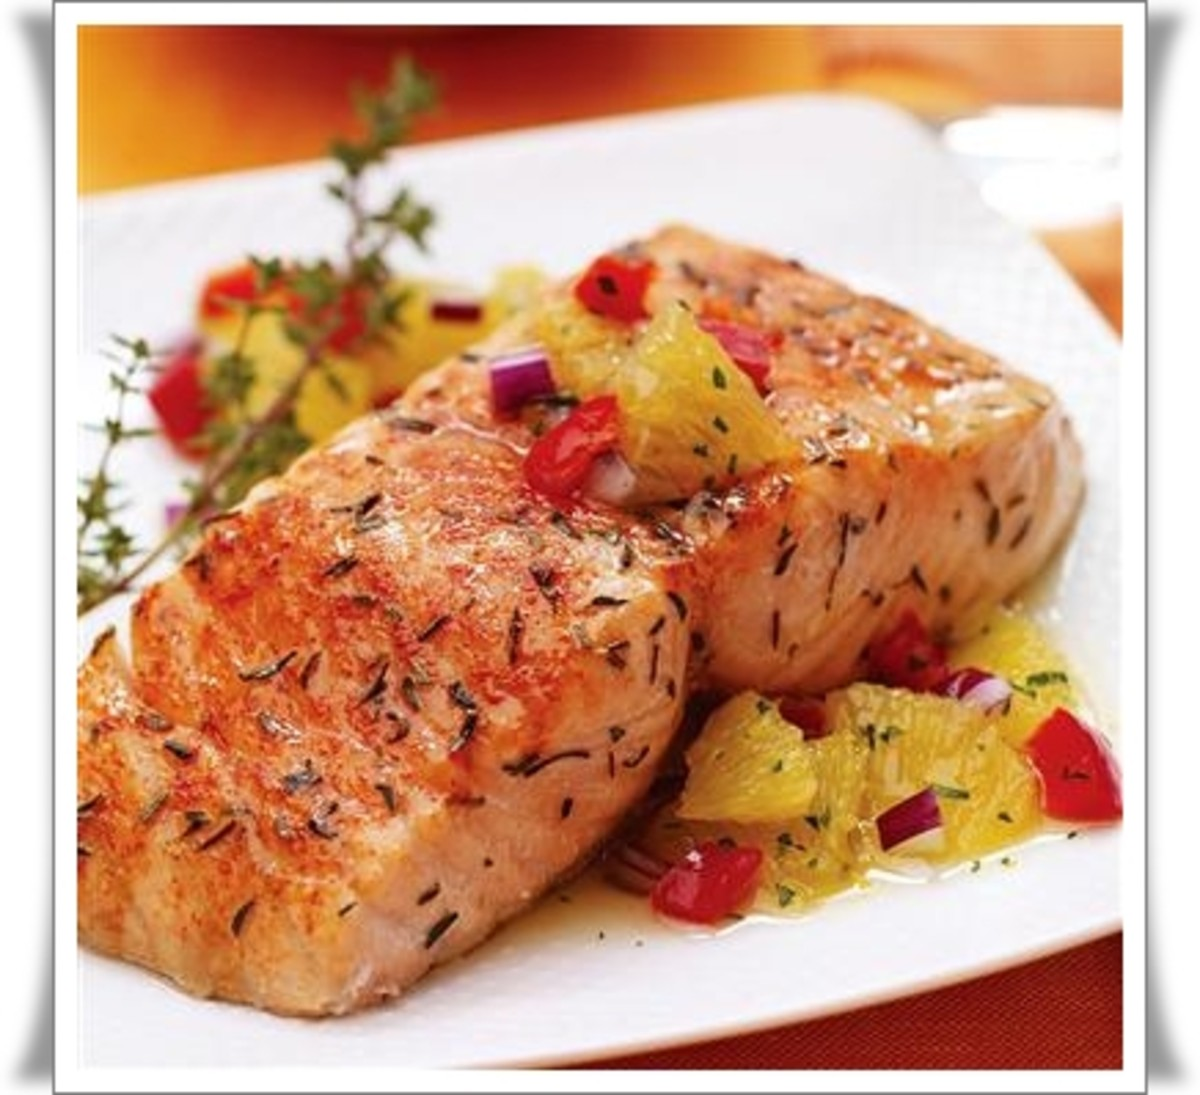 Citrus Salmon with Orange Relish - Photo: Courtesy of McCormick Recipes